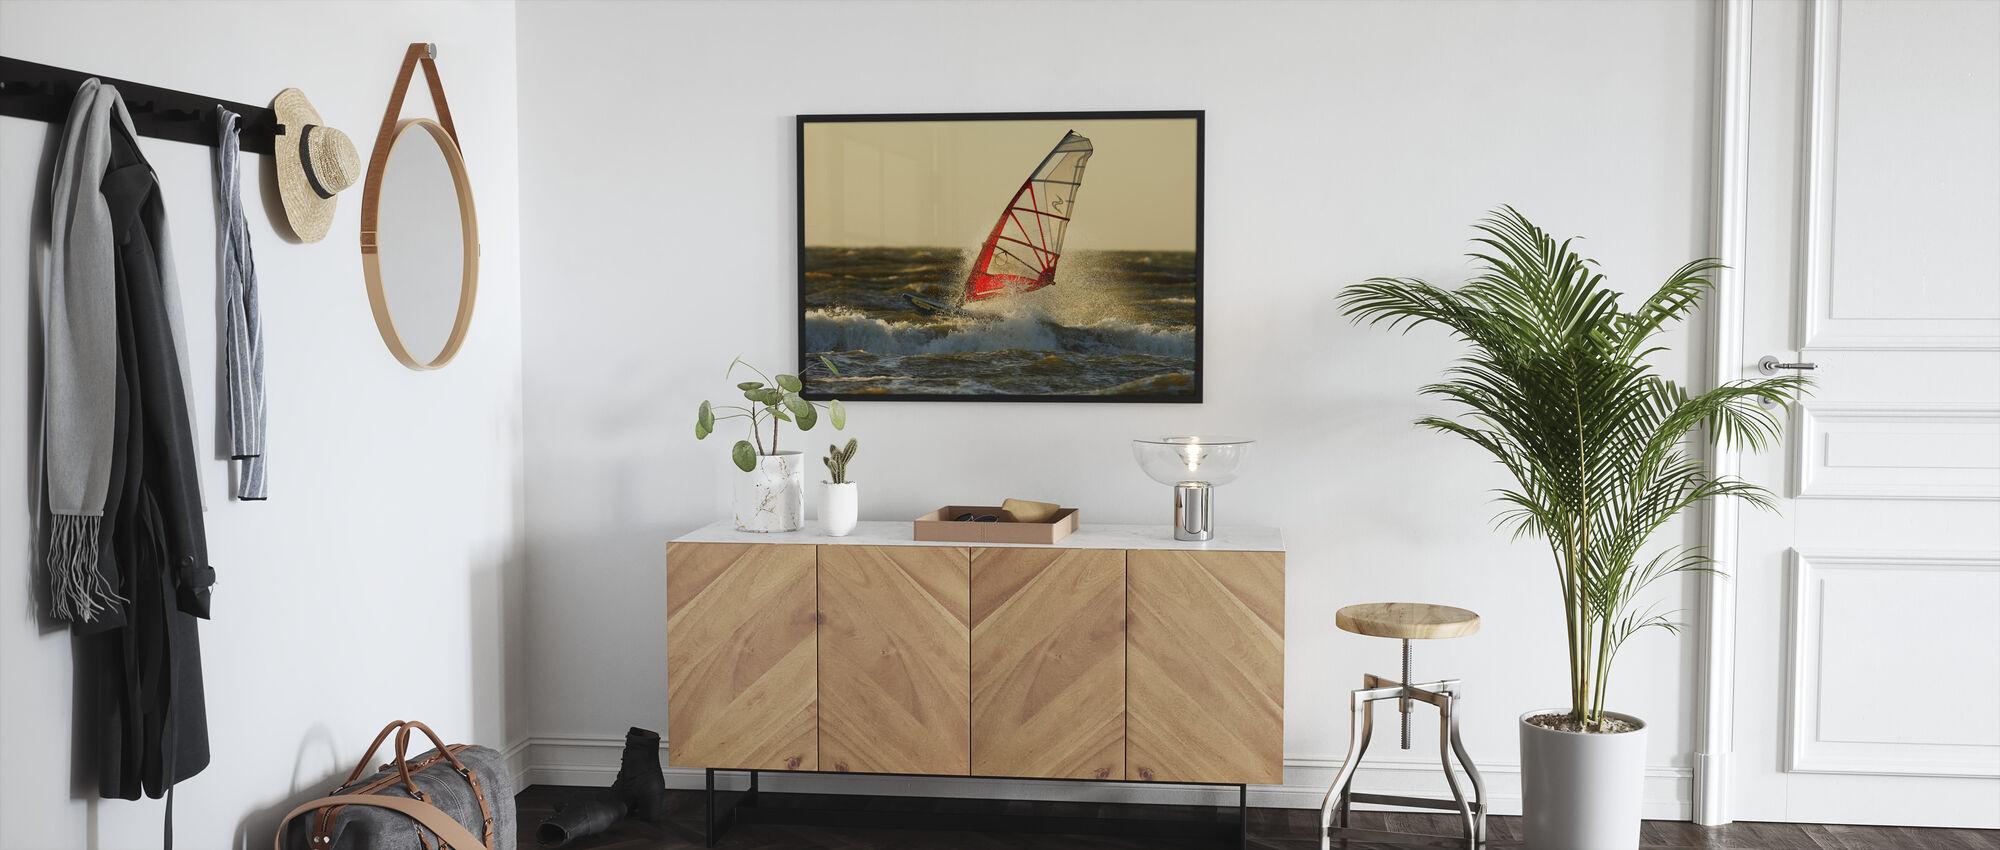 Surfing in Sweden, Europe - Framed print - Hallway